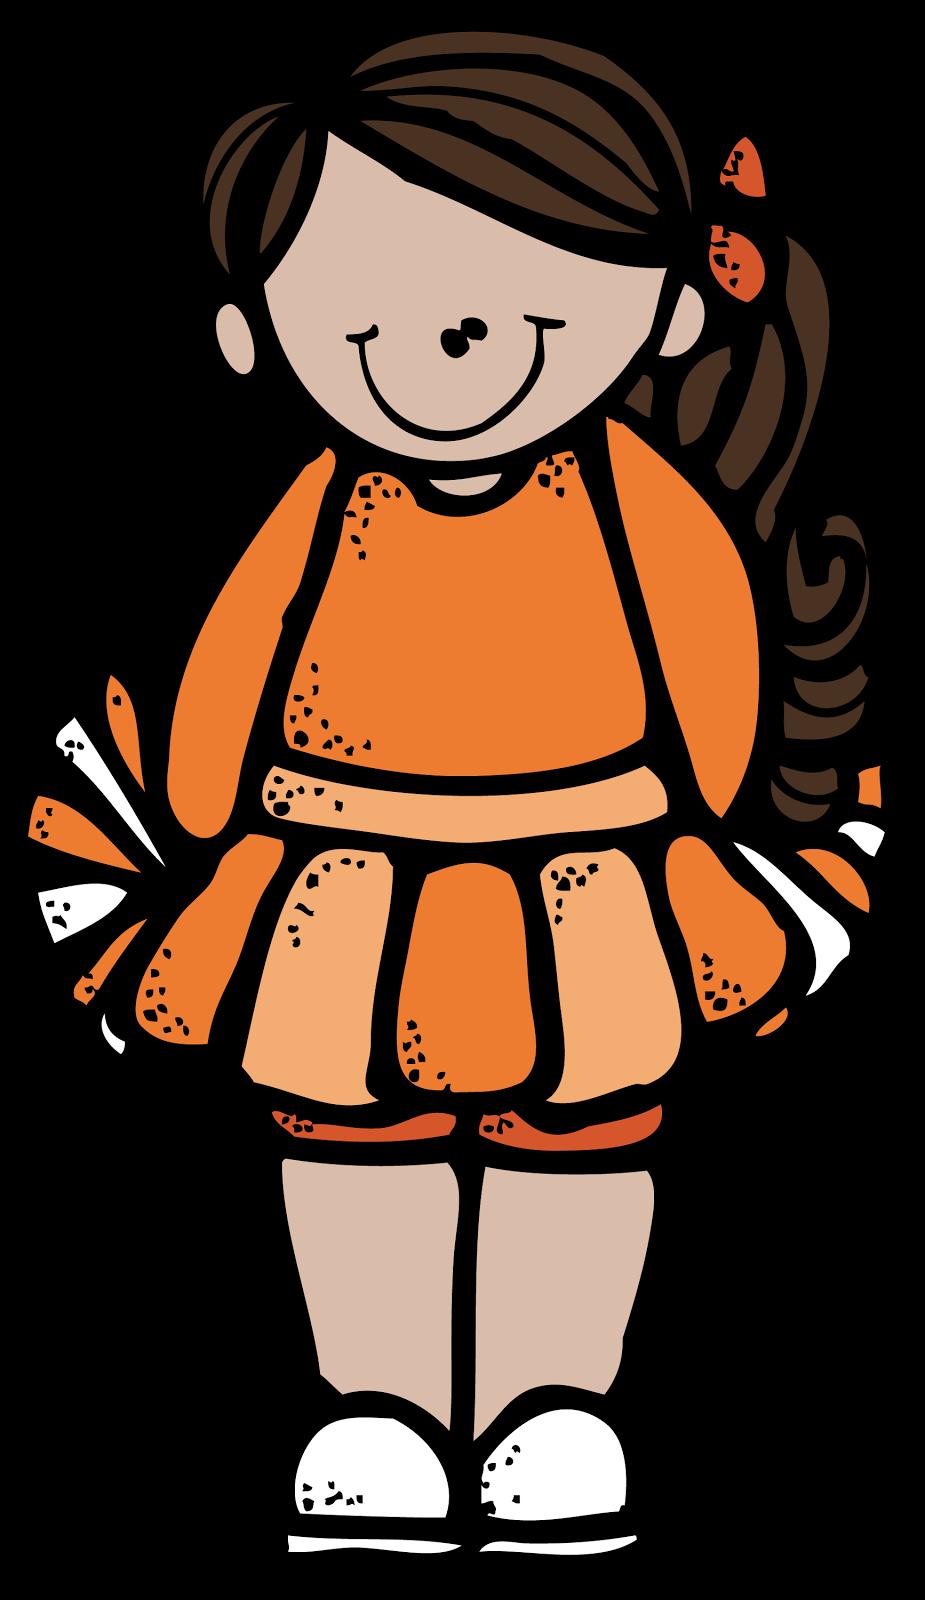 Clipart rock printable. Cheerleader melonheadz colored png